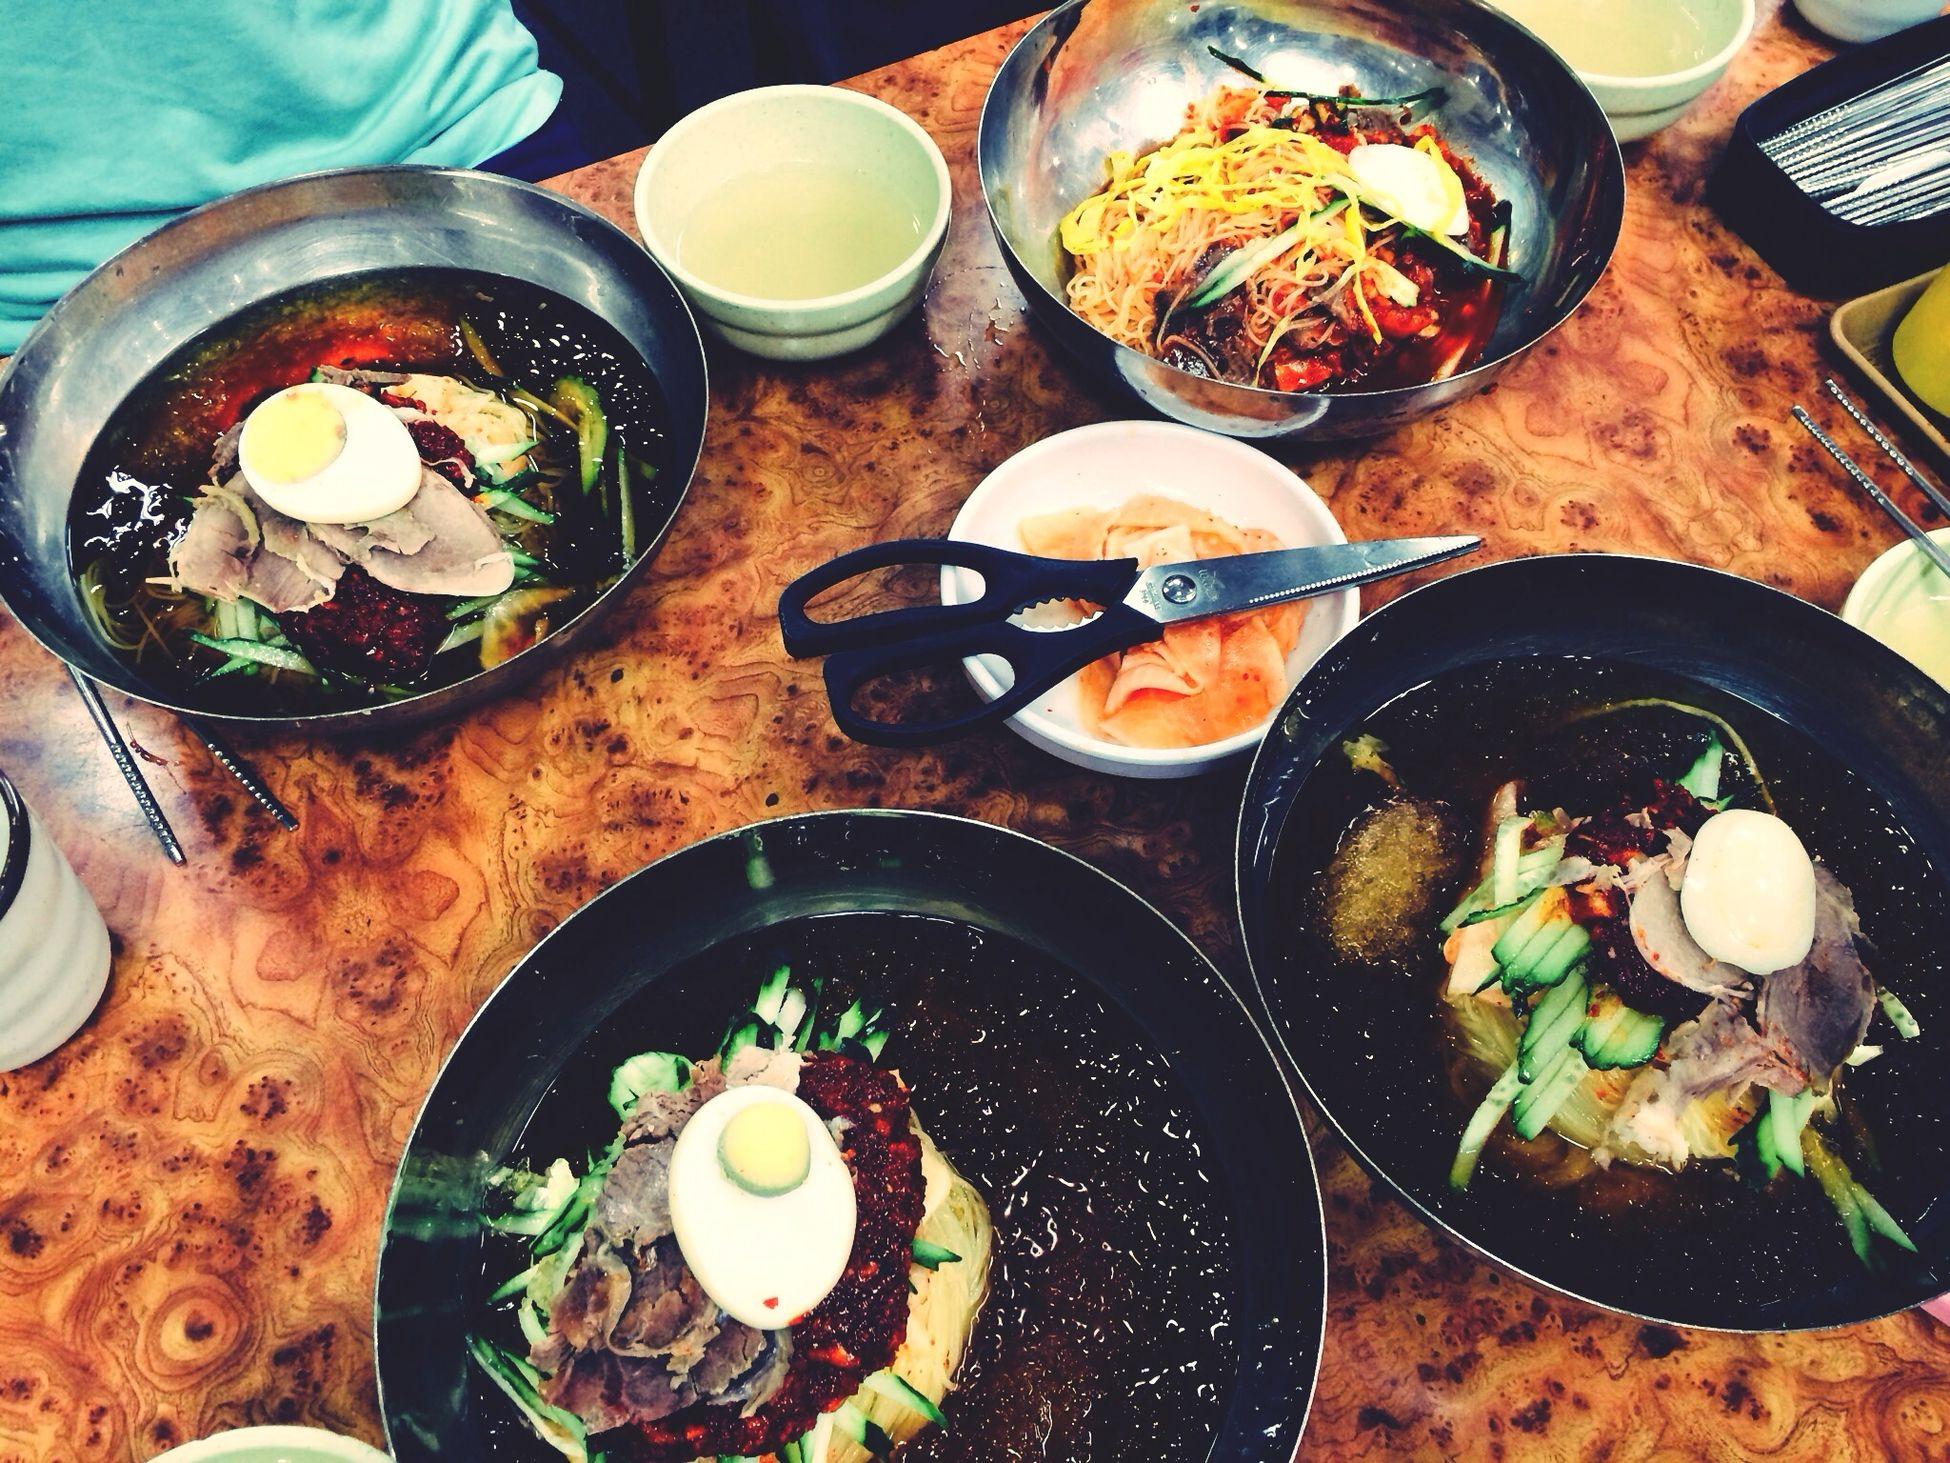 Busan! Eating Enjoying A Meal In My Mouf 비오는 부산 반가웟?